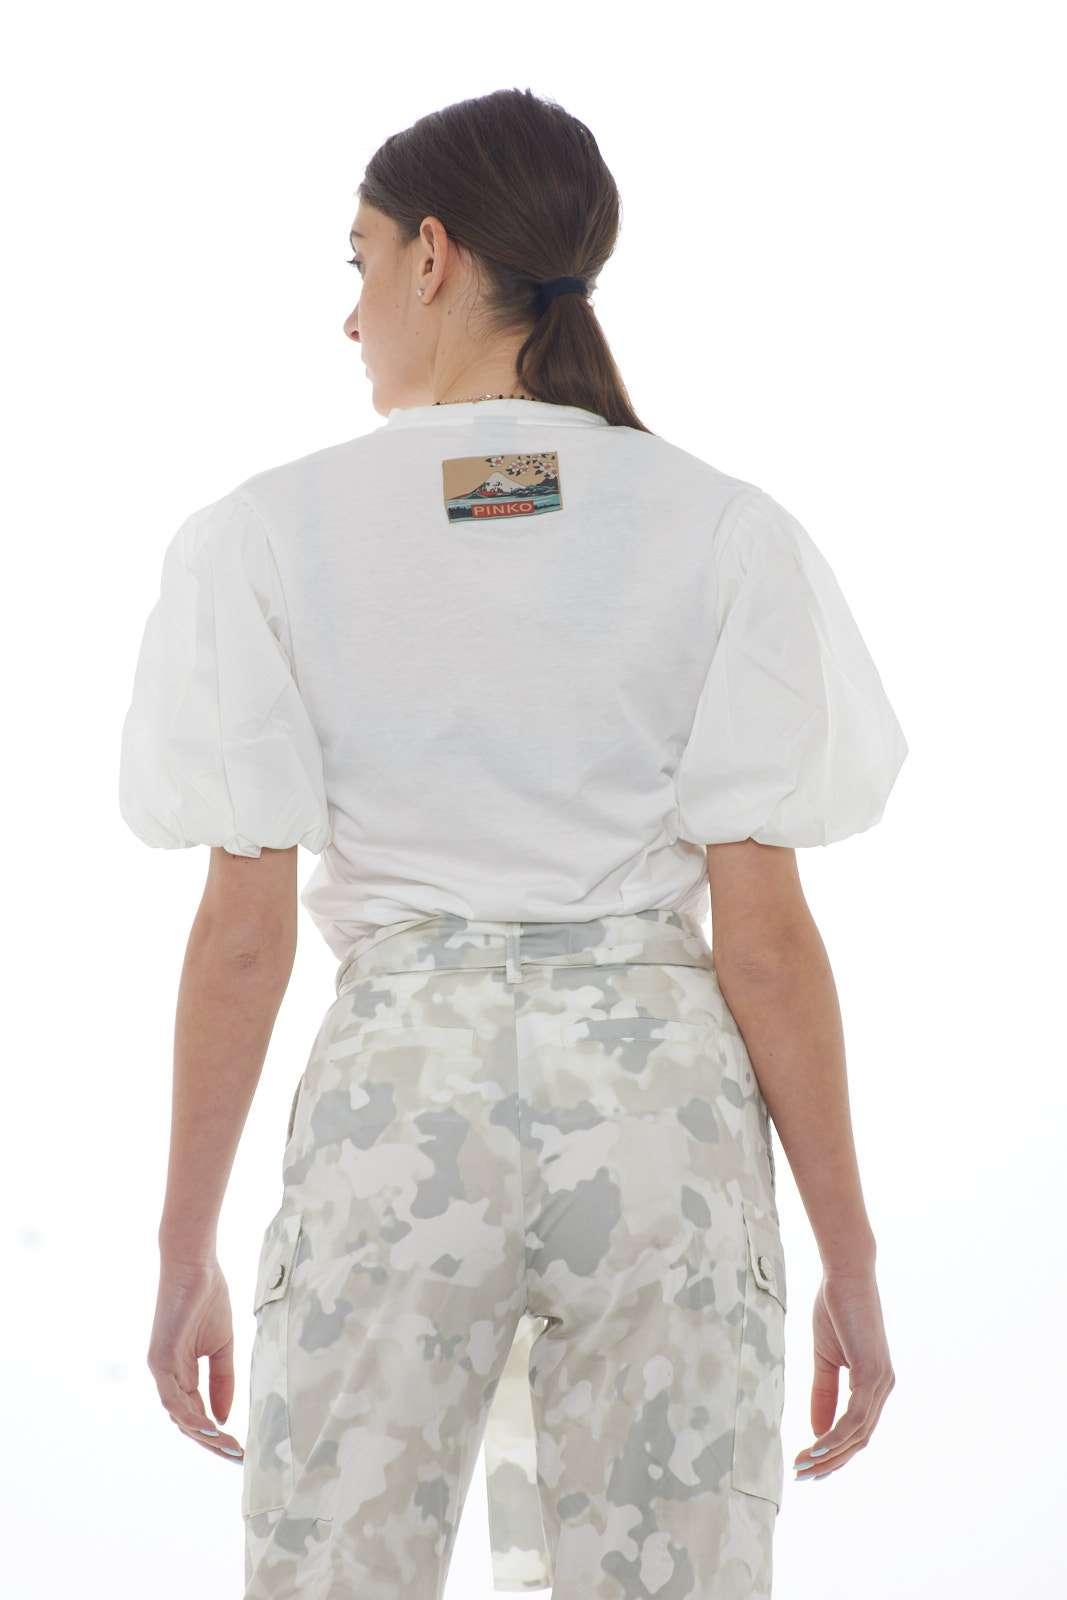 https://www.parmax.com/media/catalog/product/a/i/PE-outlet_parmax-t-shirt-donna-Pinko-1b14gk-C.jpg